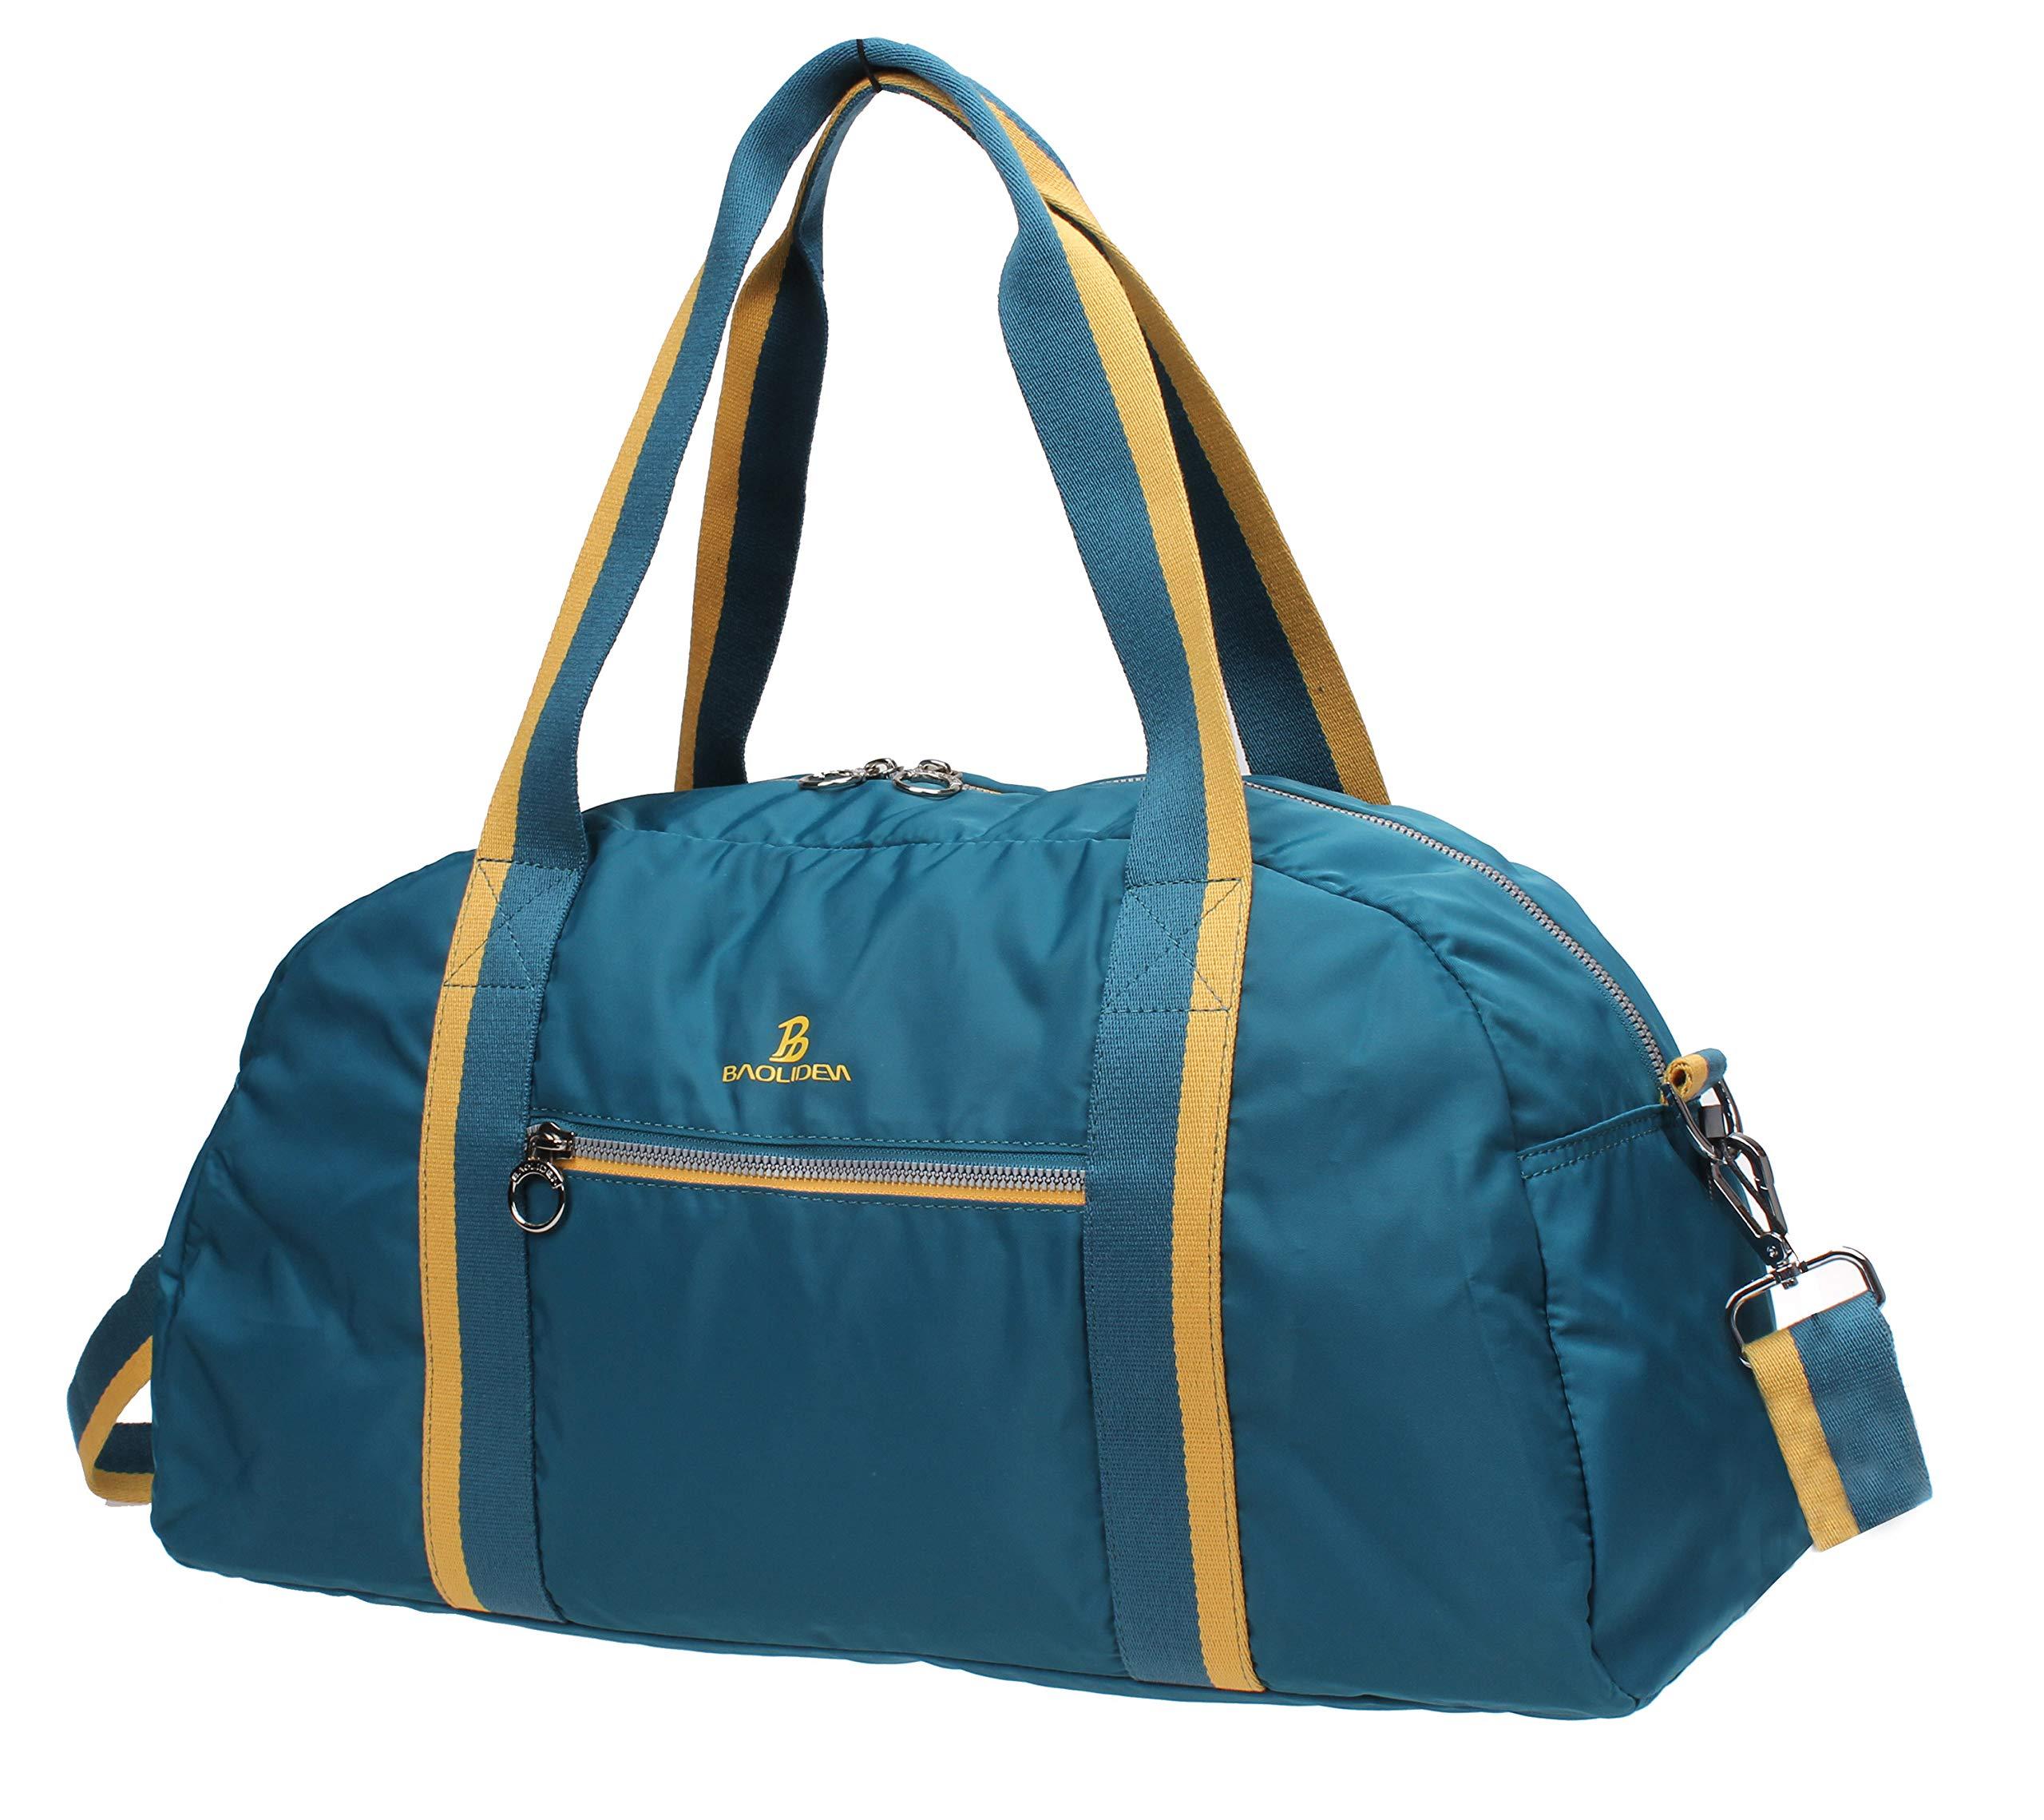 Iblue Small Travel Duffel Waterproof Nylon Gym Handbag Sports Gear Bag Bl10 (blue)